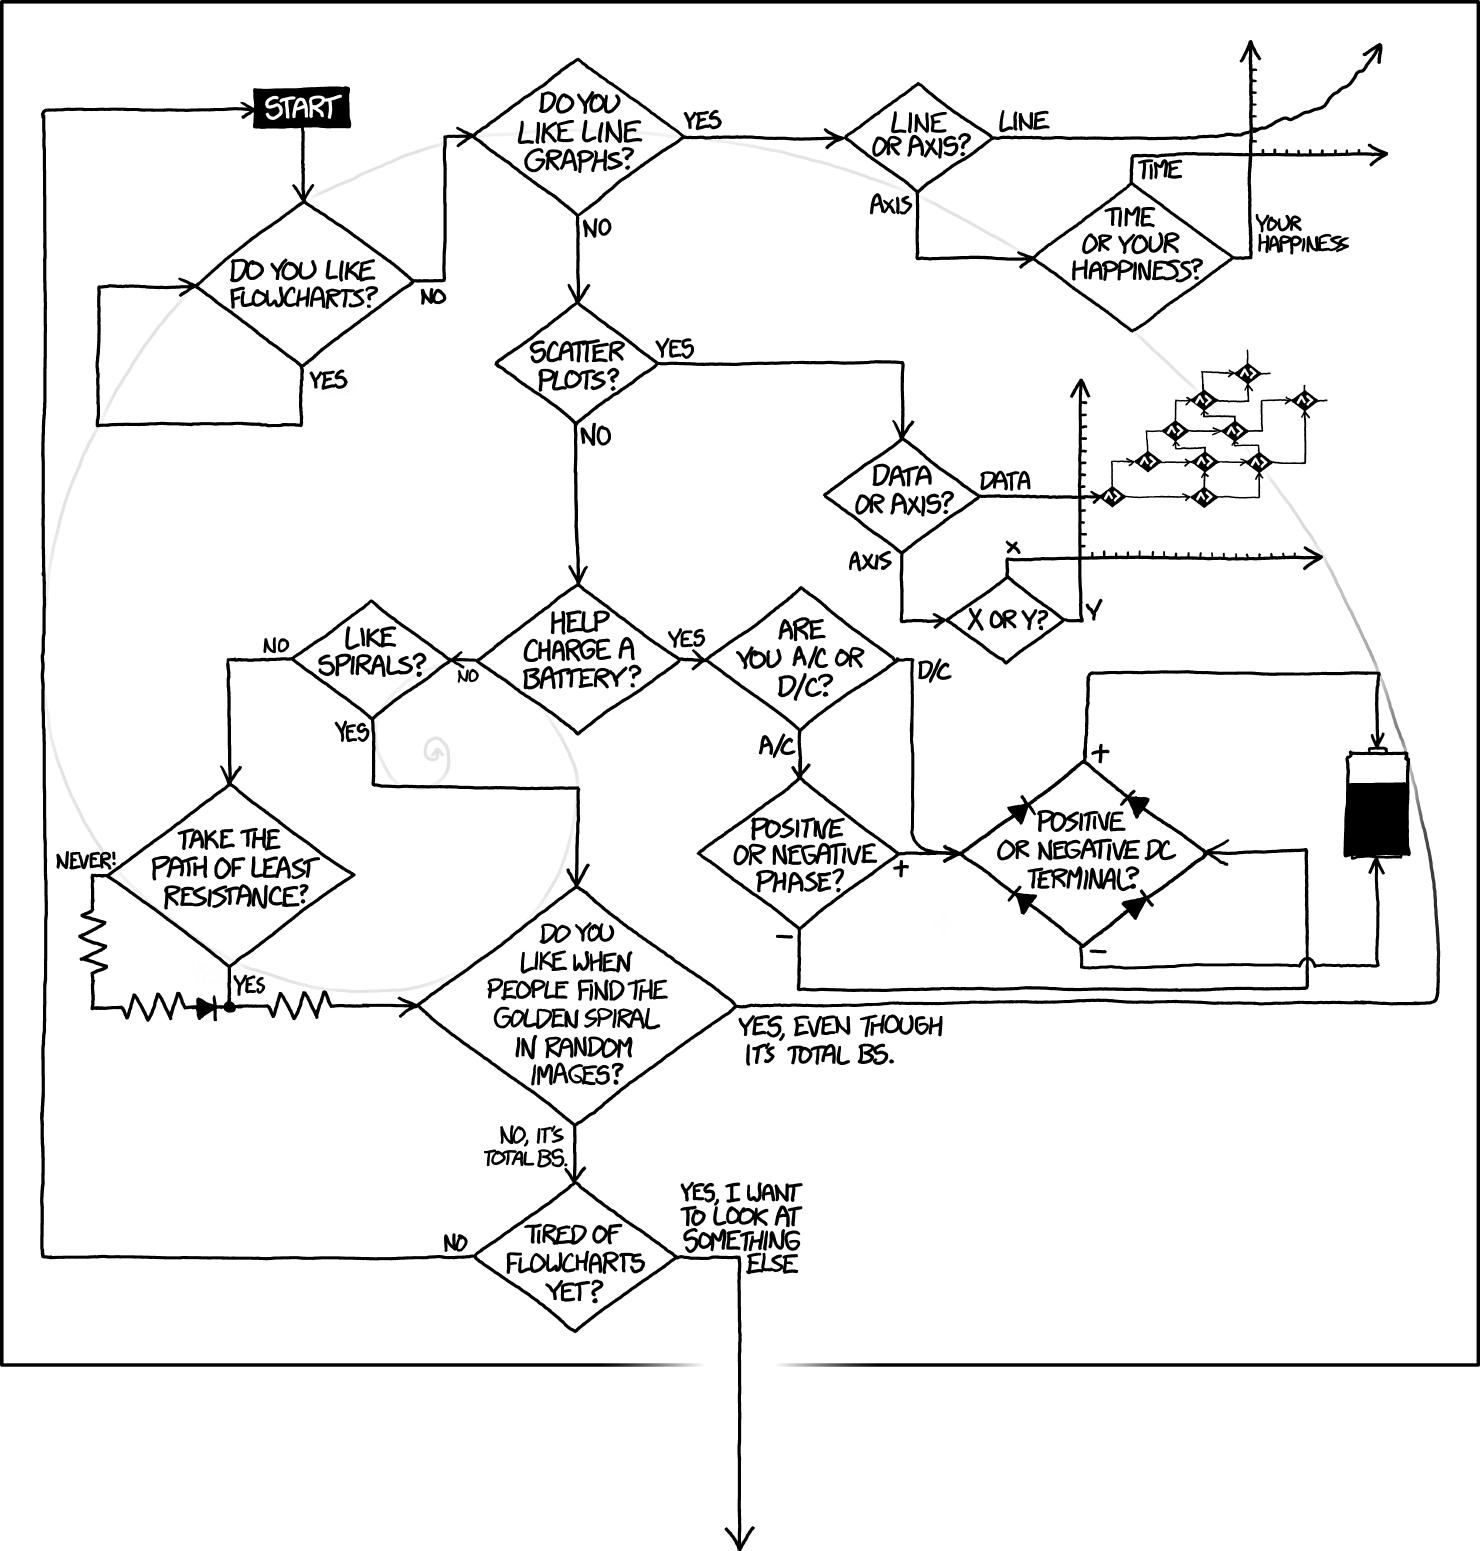 Xkcd Flowcharts